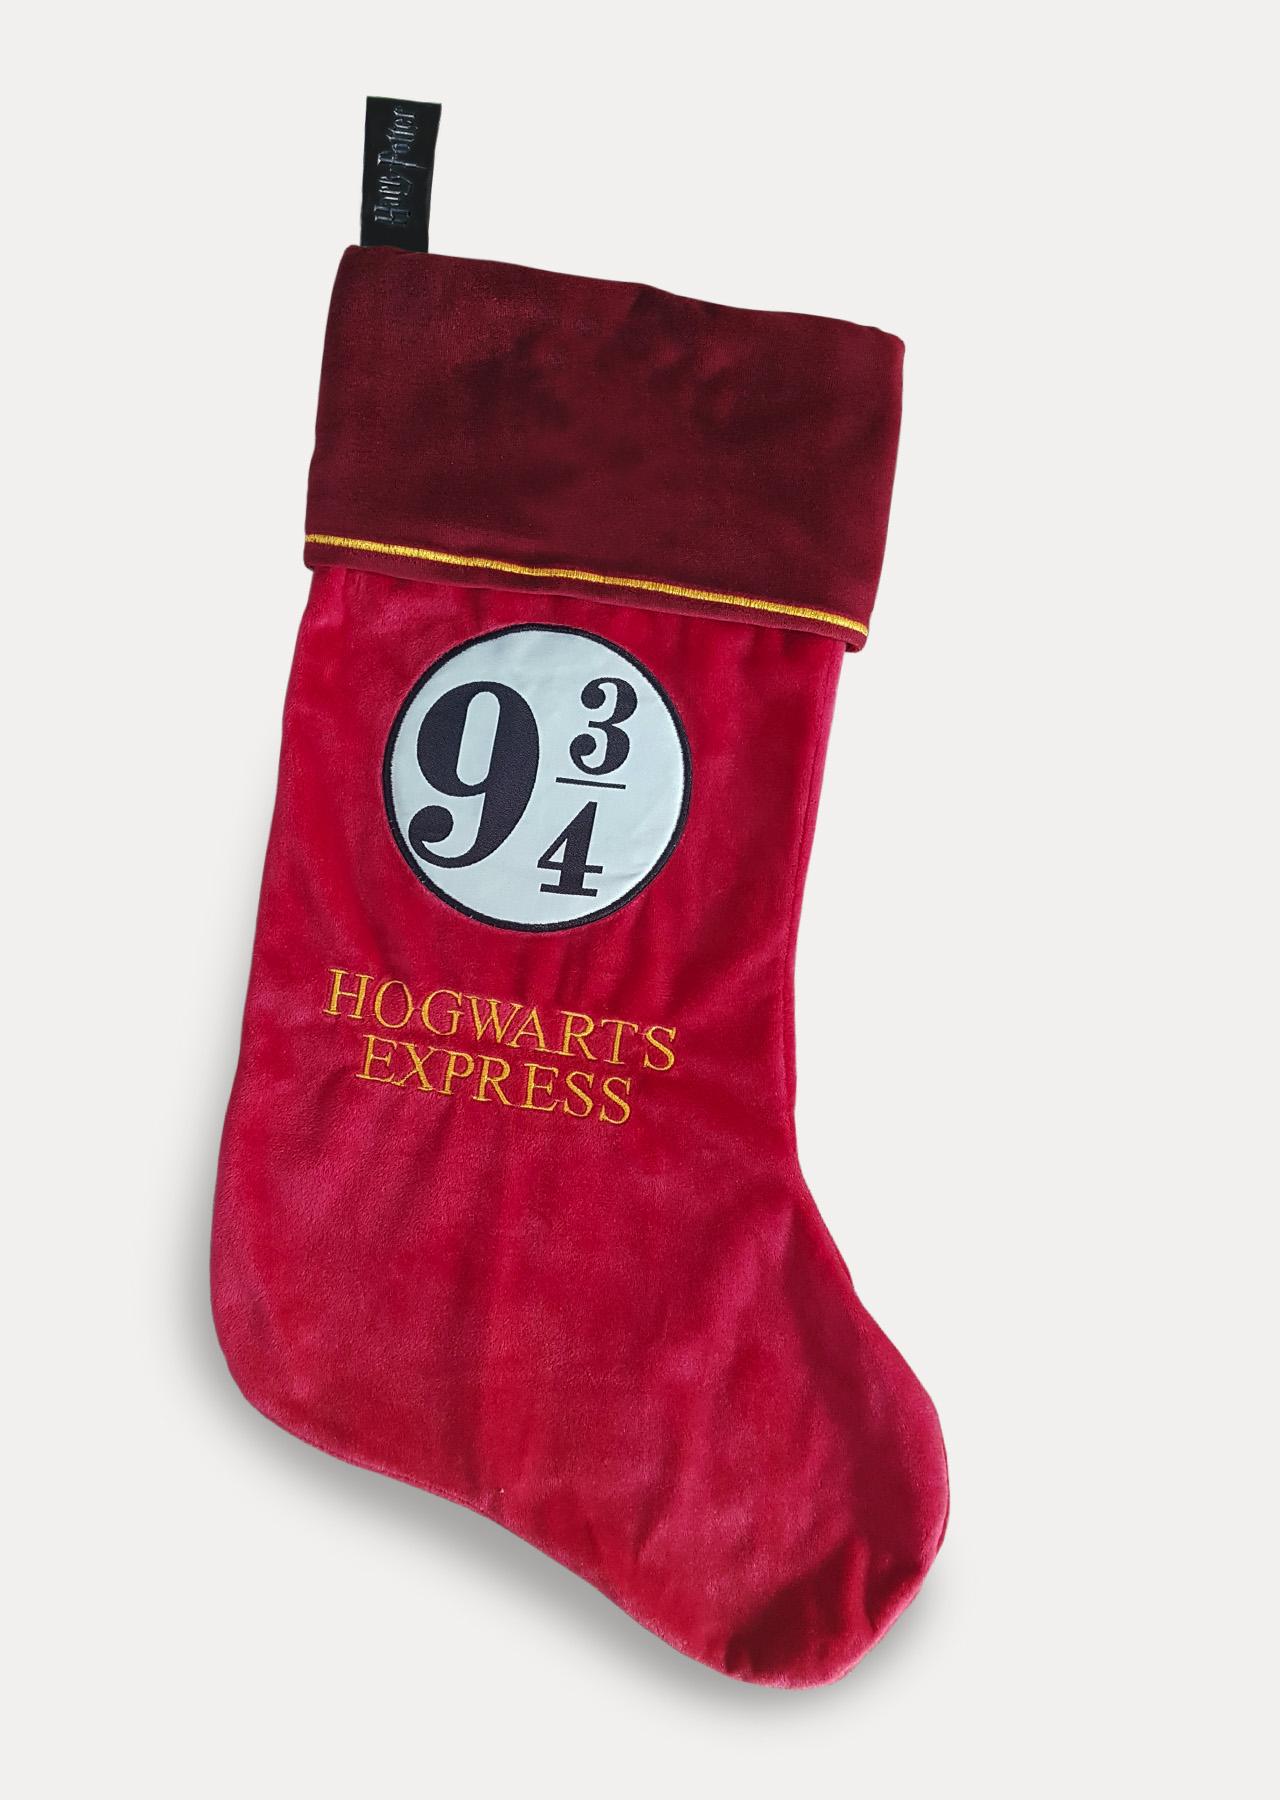 Stocking Christmas.Hogwarts Express 9 3 4 Harry Potter Fleece Christmas Stocking